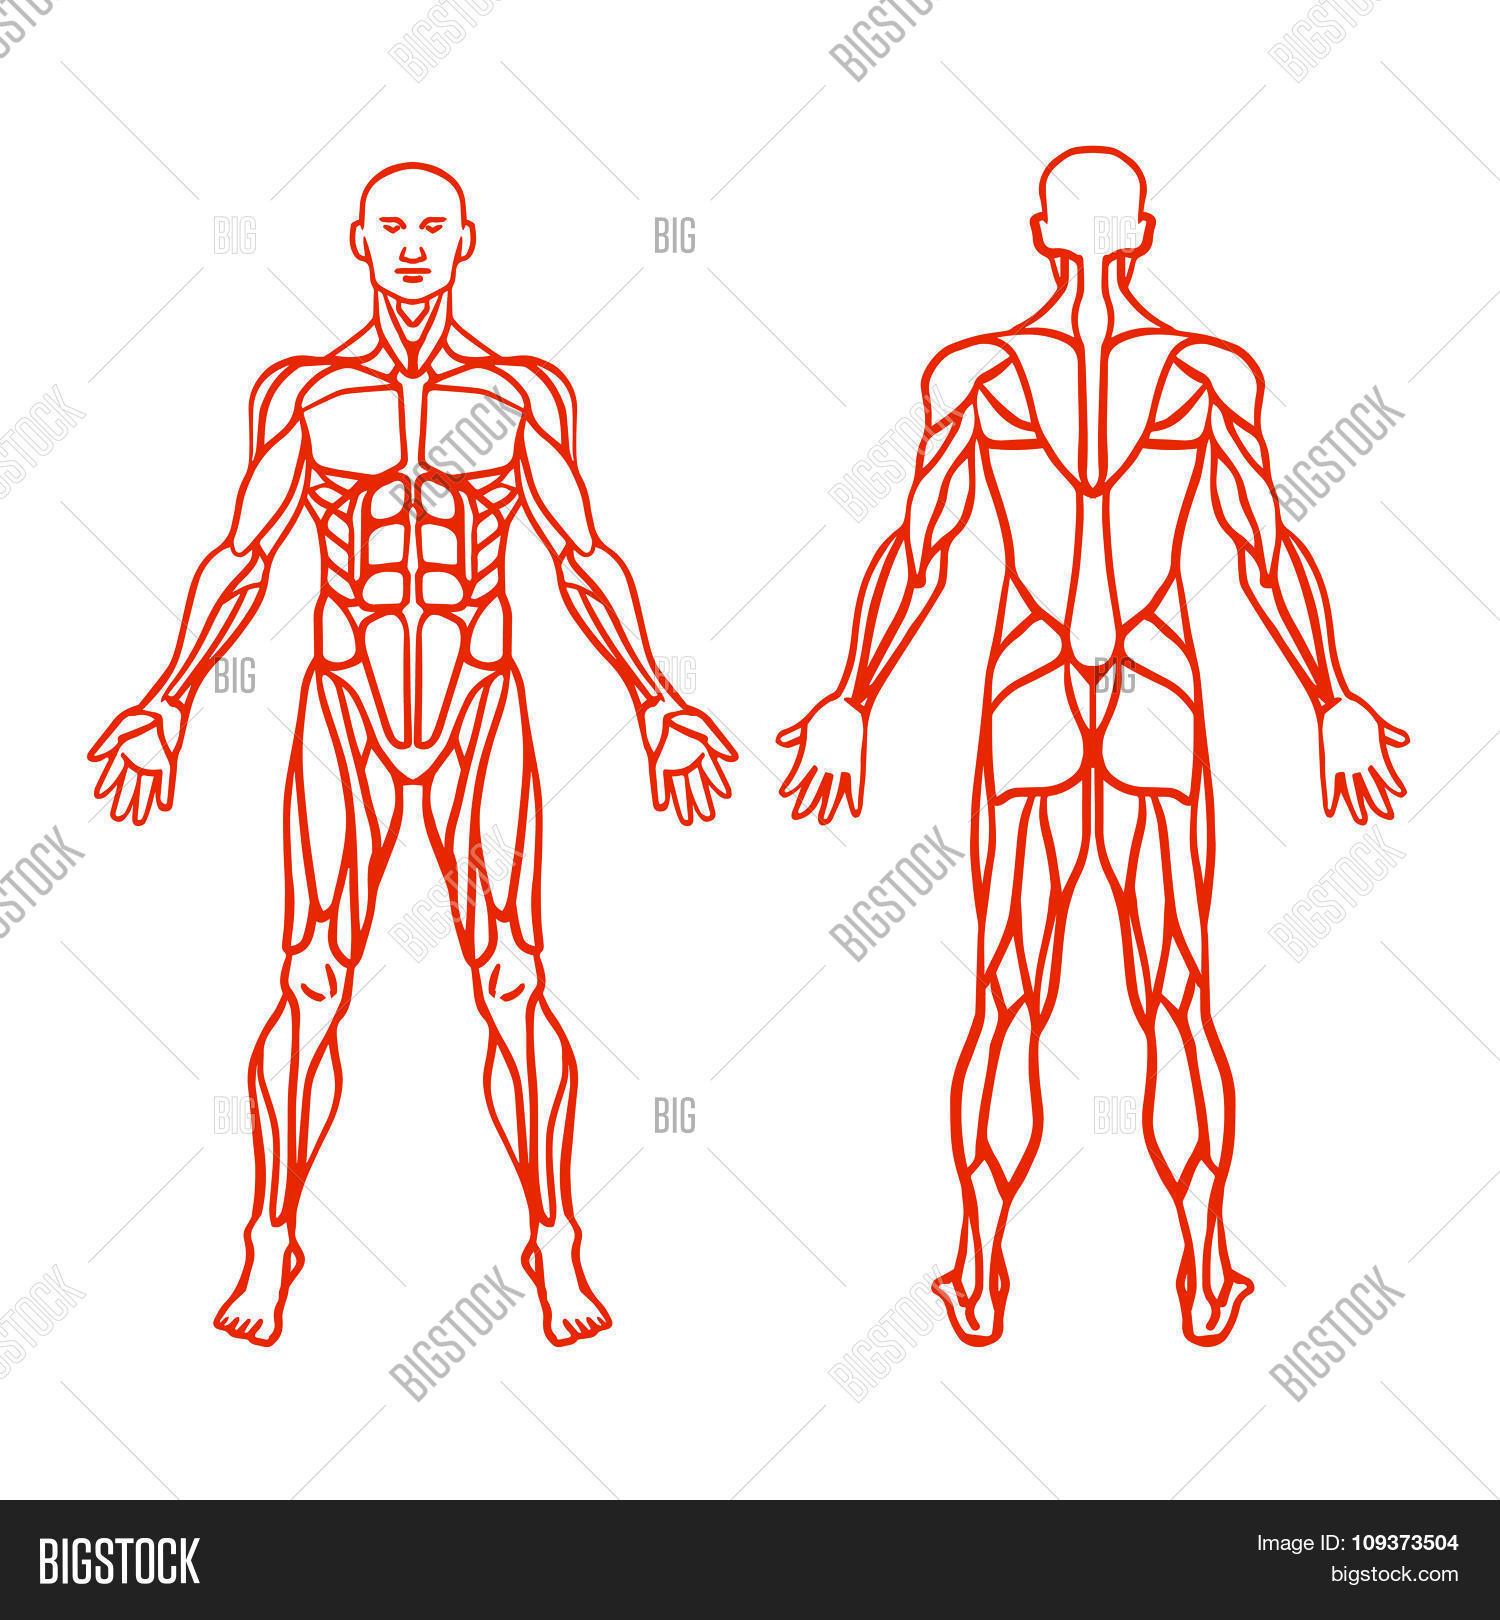 Anatomy Male Muscular Vector & Photo (Free Trial) | Bigstock